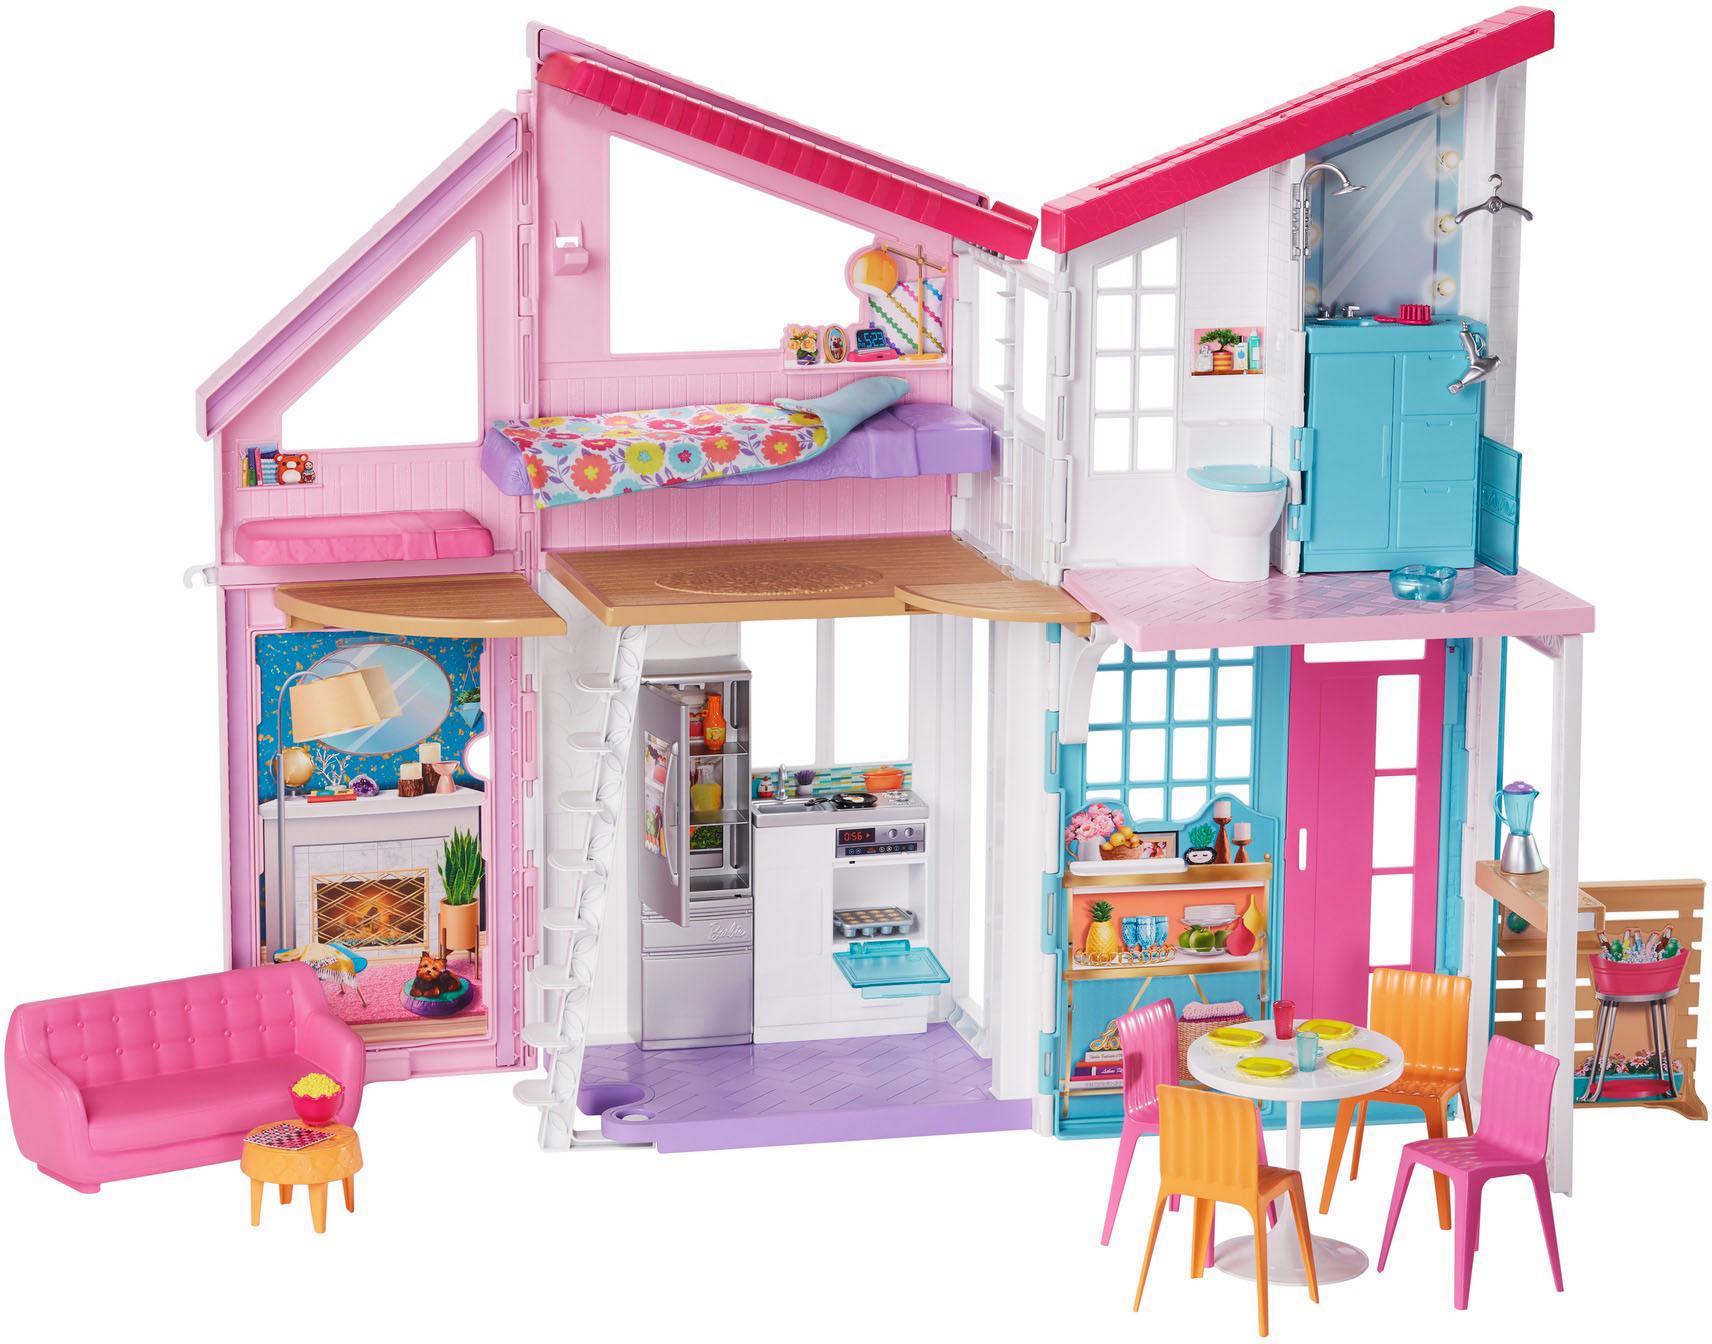 "Mattel Puppenhaus ""Barbie Malibu Puppenhaus"" Kindermode/Spielzeug/Puppen/Puppenhaus"